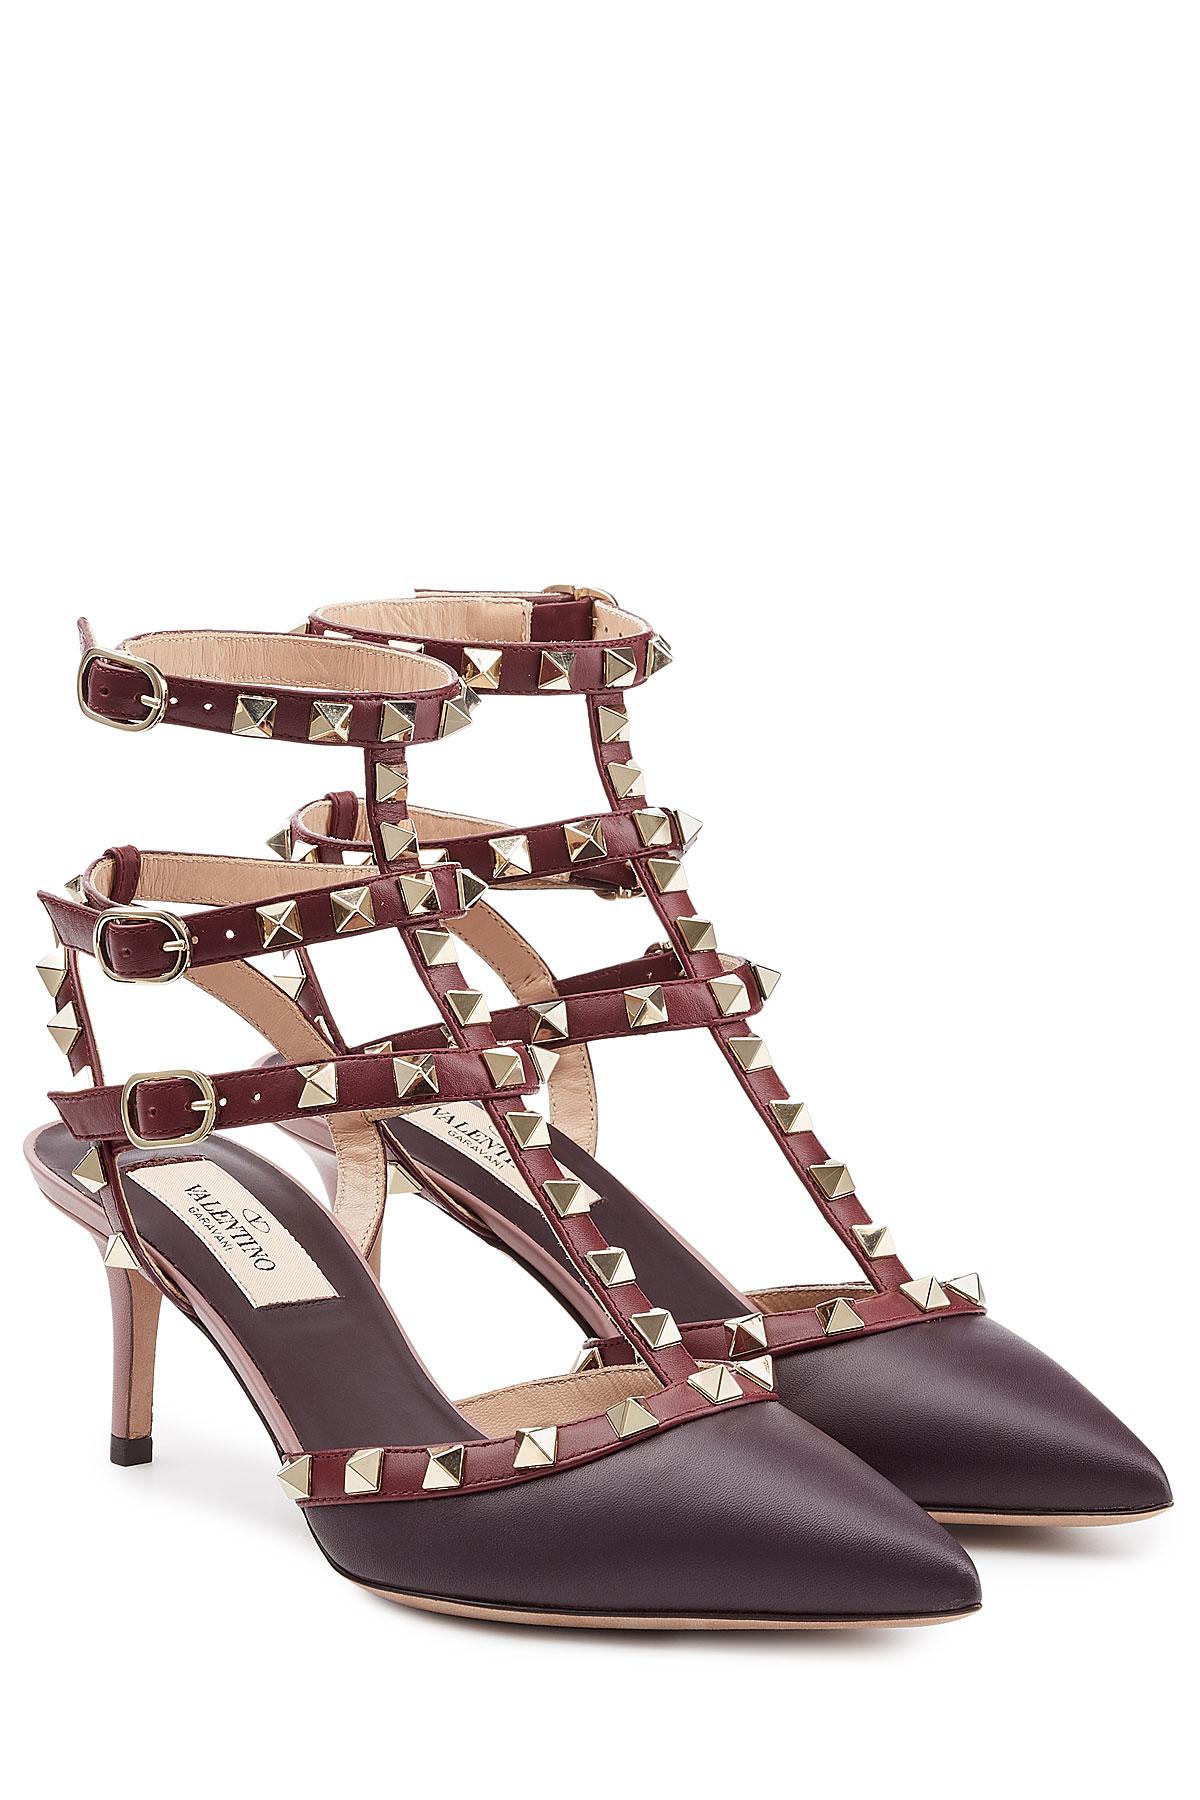 valentino 39 rockstud rolling 39 pumps in brown lyst. Black Bedroom Furniture Sets. Home Design Ideas